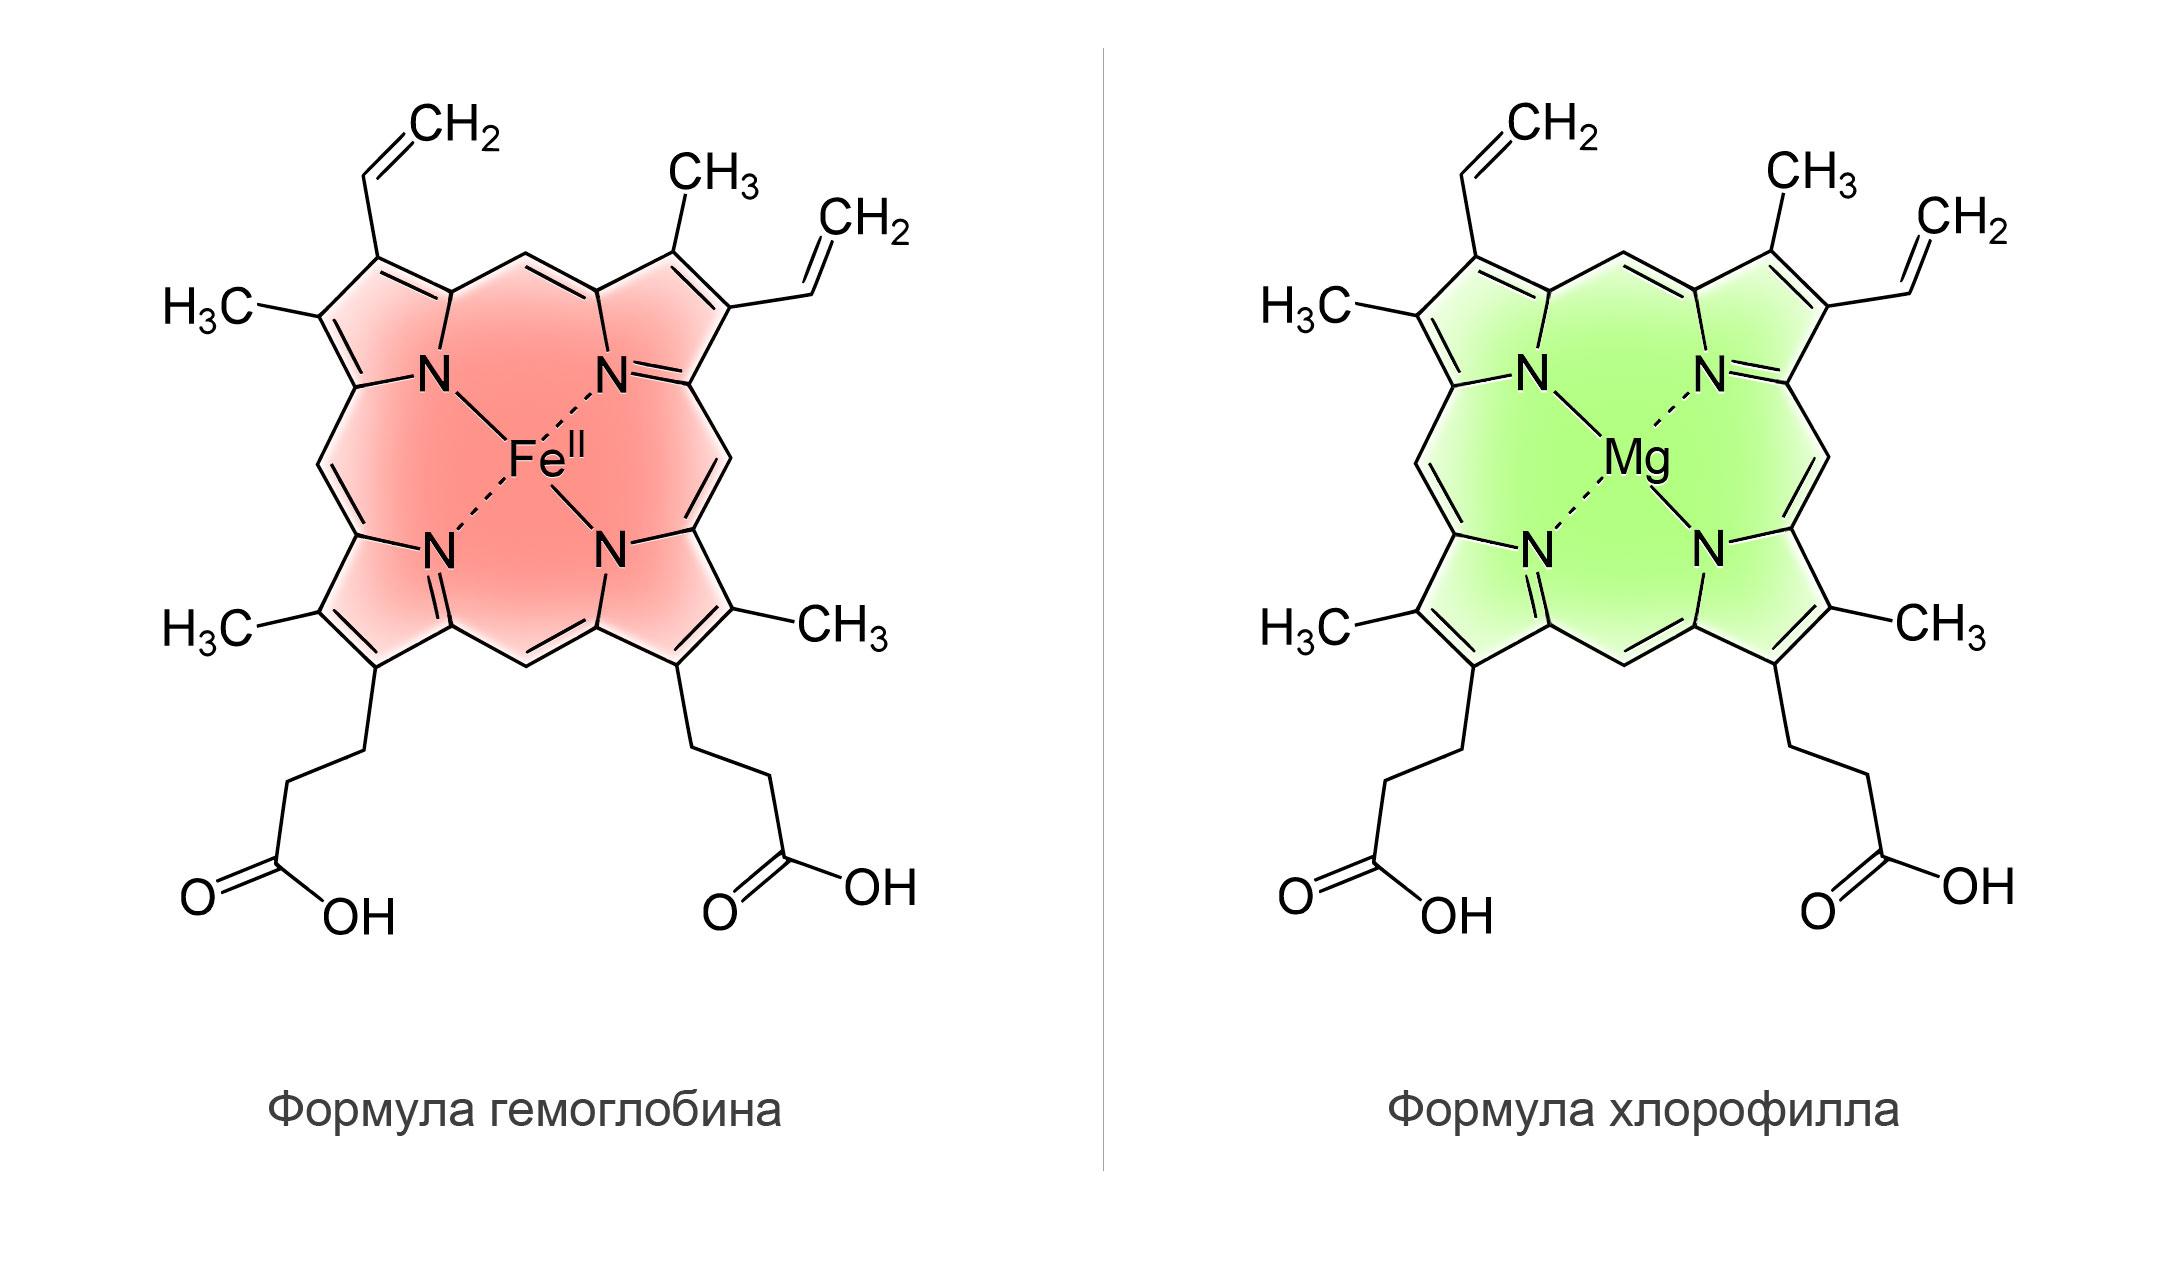 Молекула Хлорофилла и молекула гемоглобина